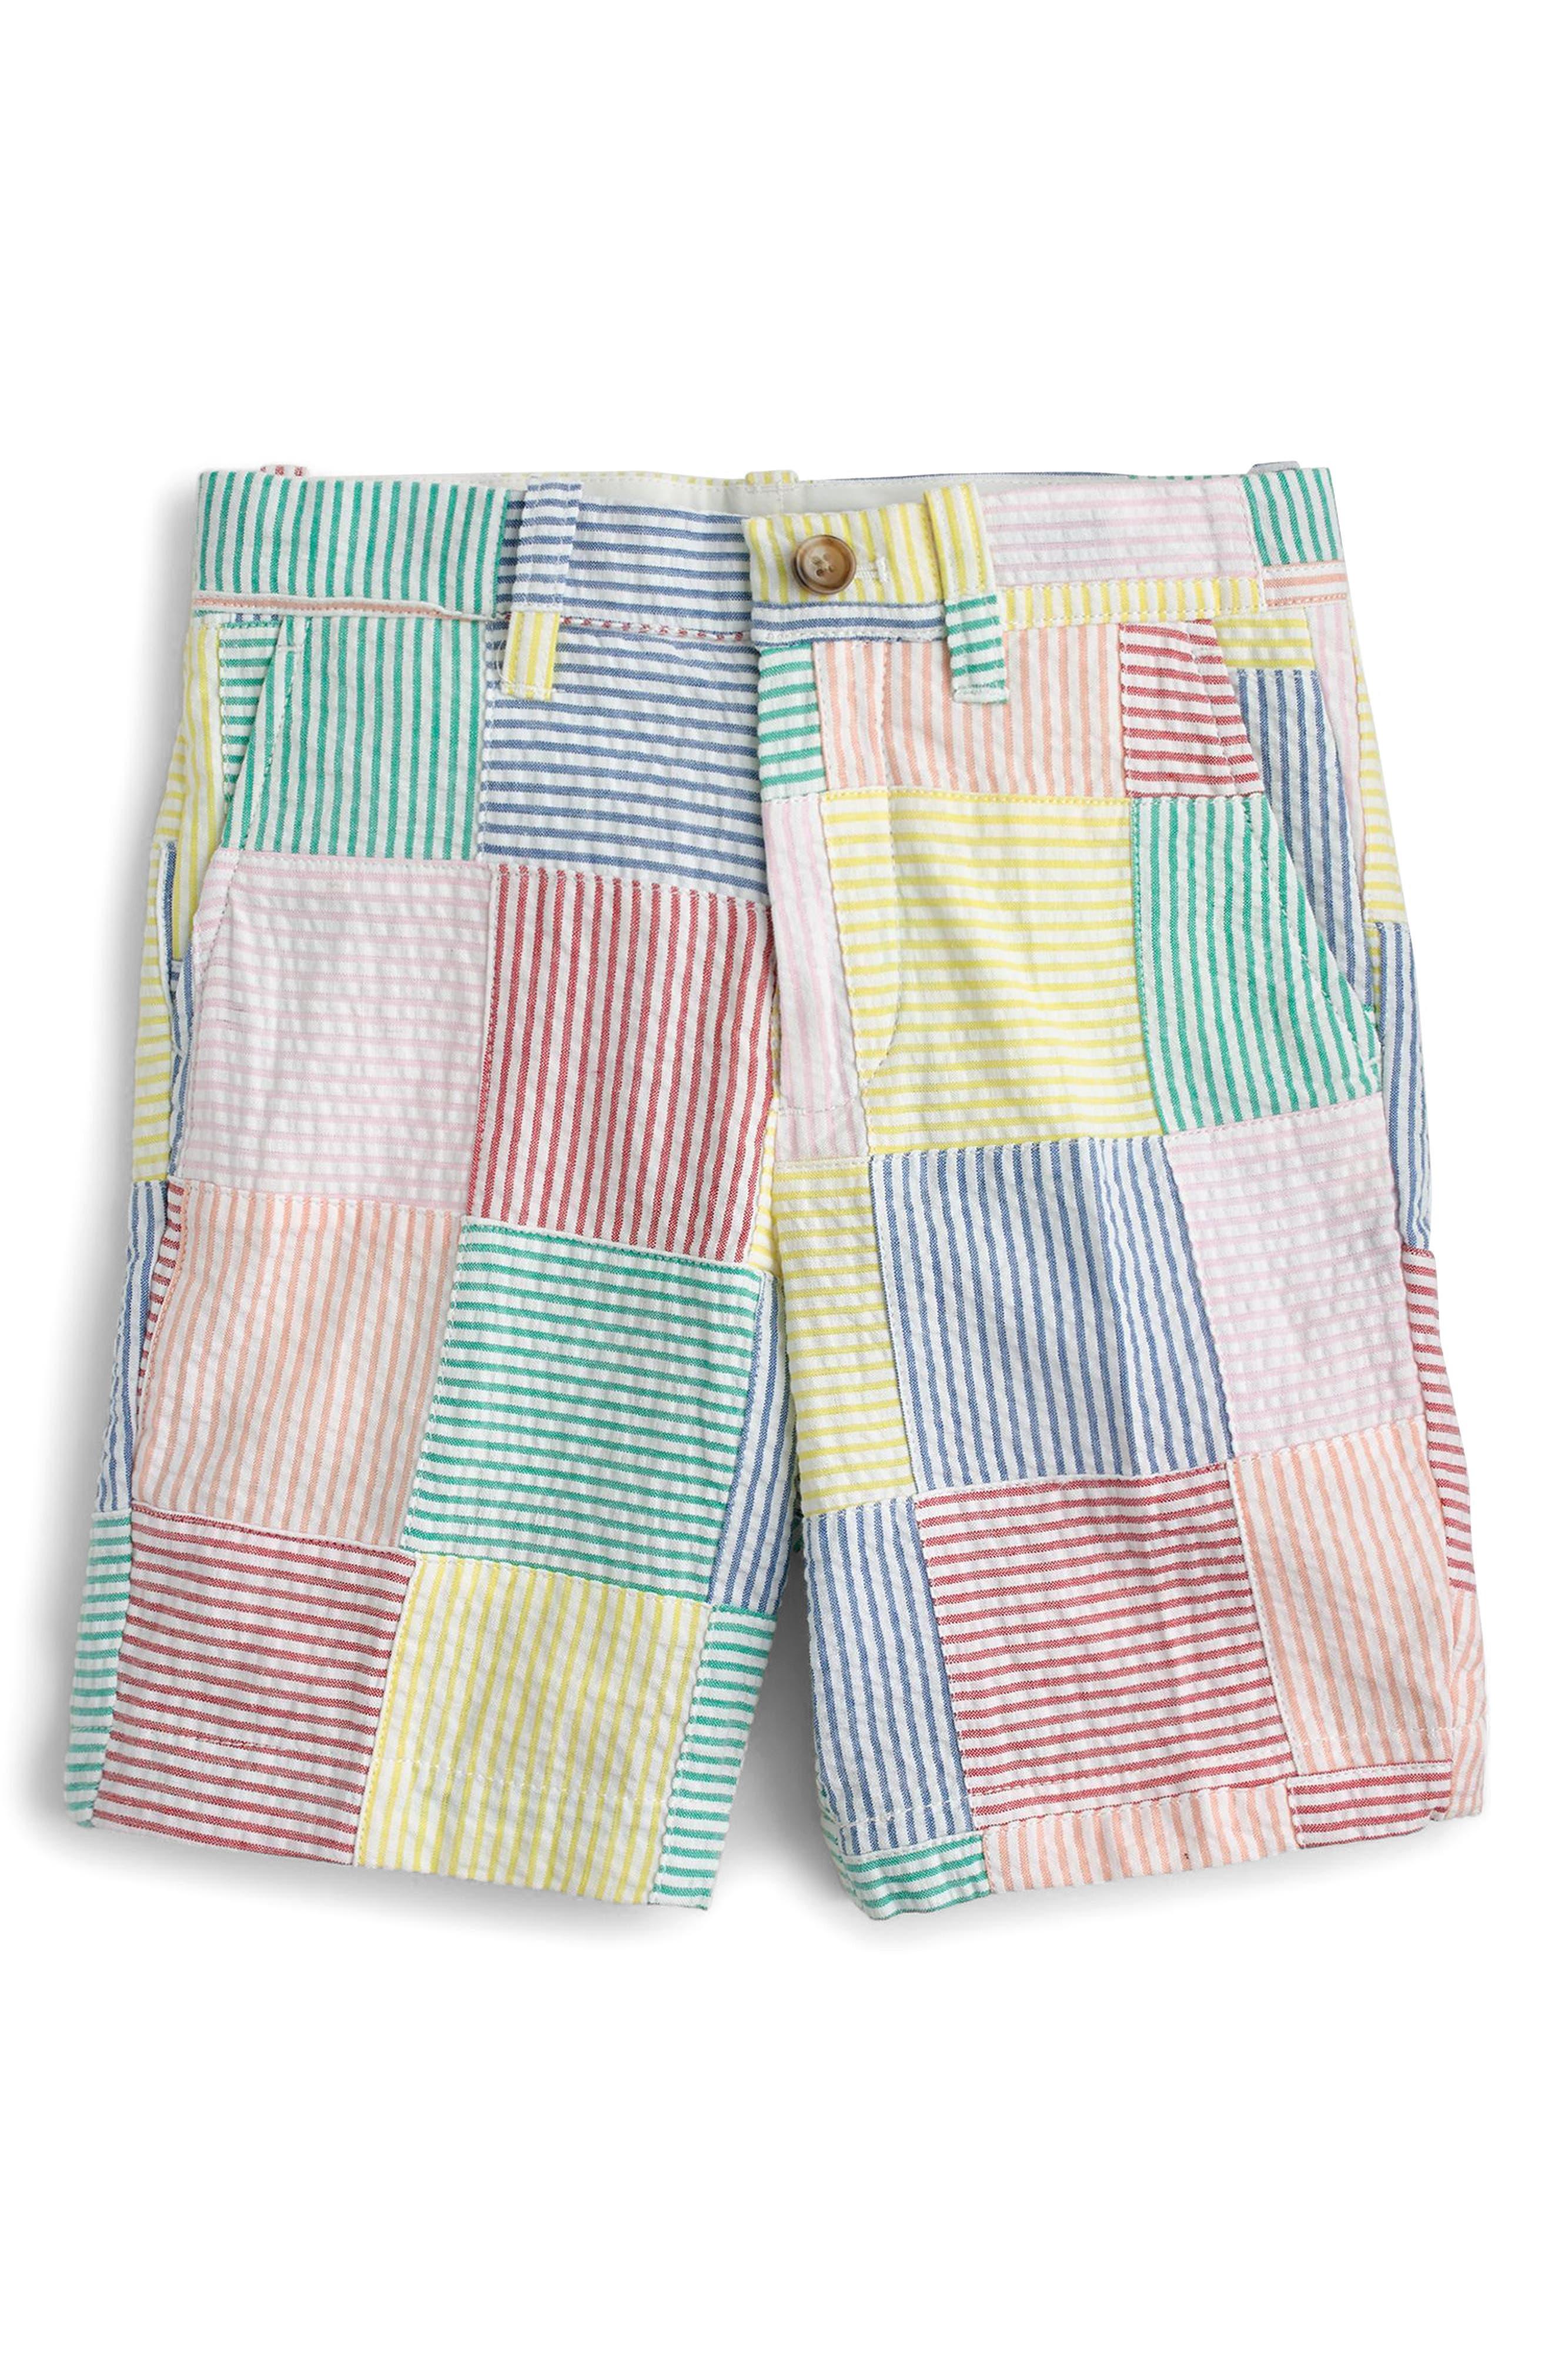 Crewcuts Stanton Patchwork Shorts